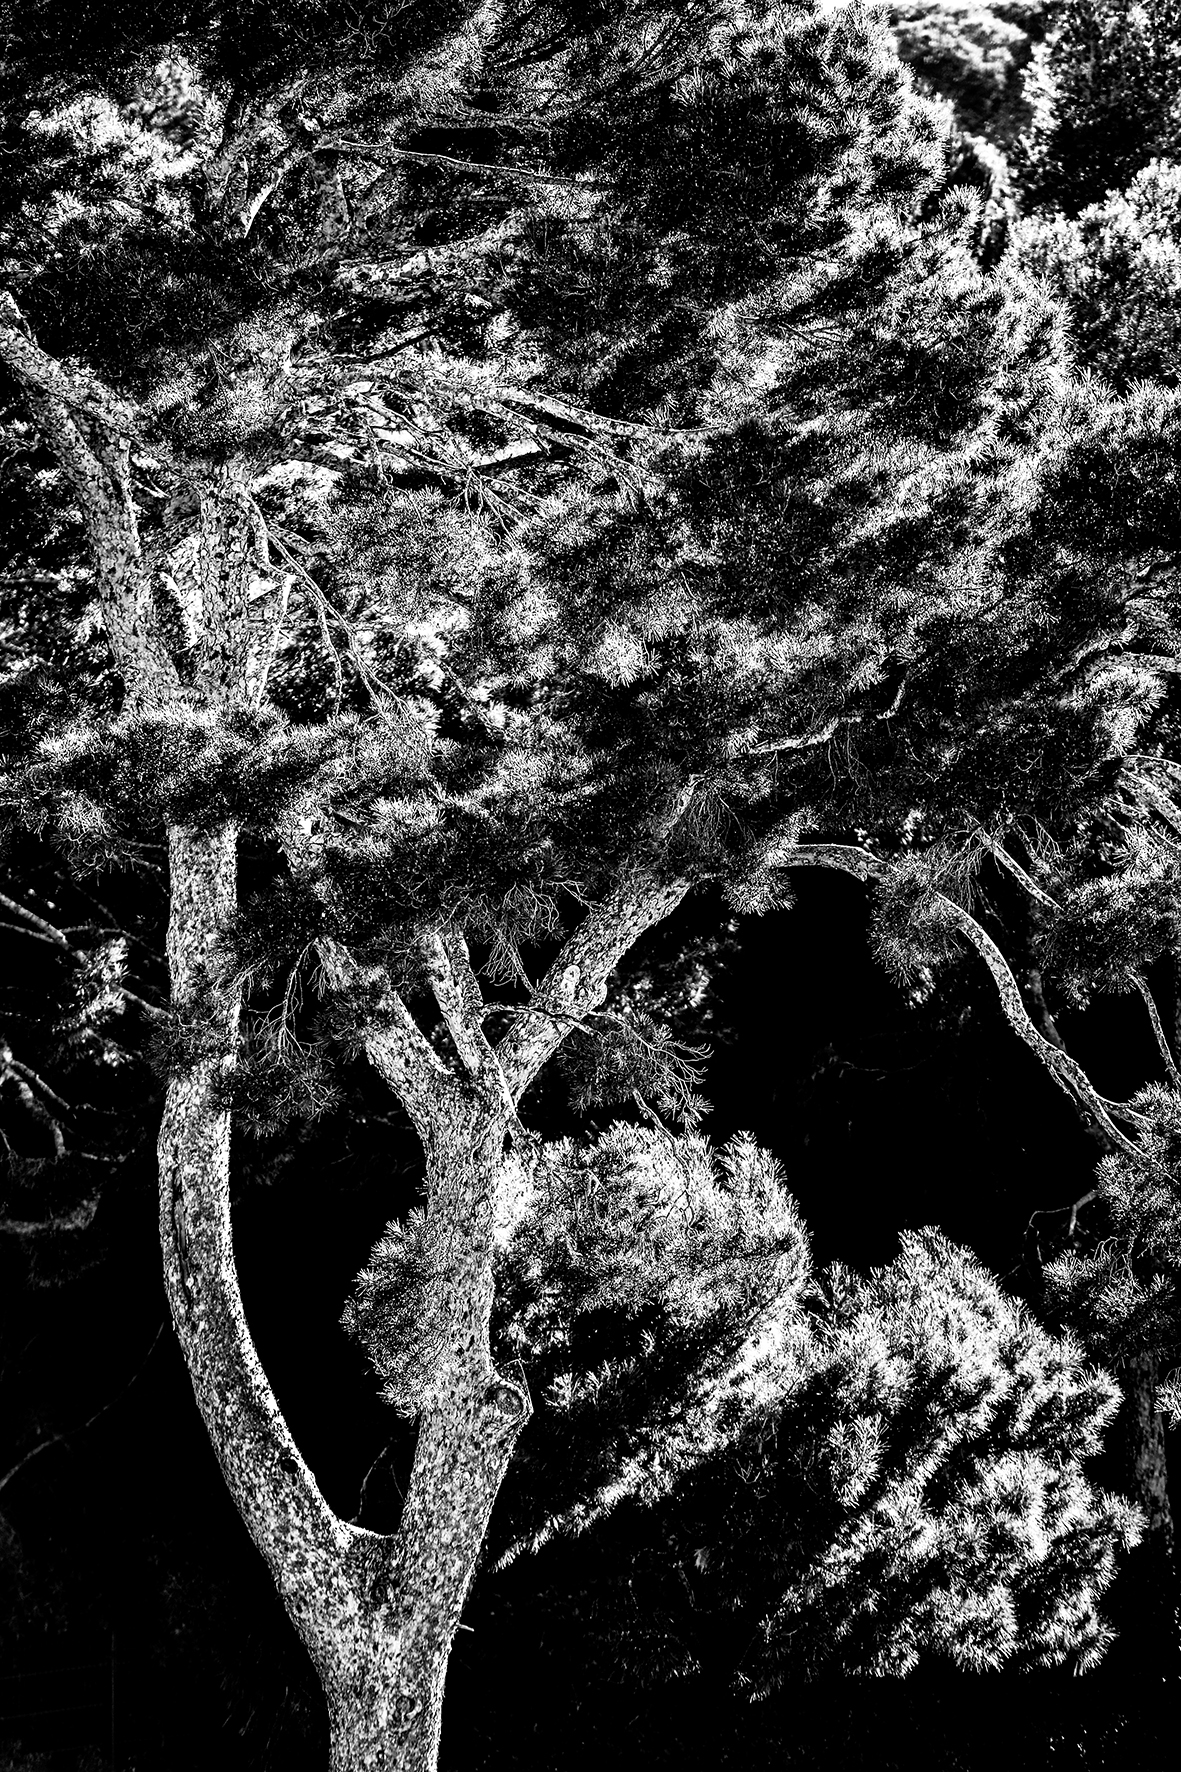 Photographe : Le graphisme naturel n°13